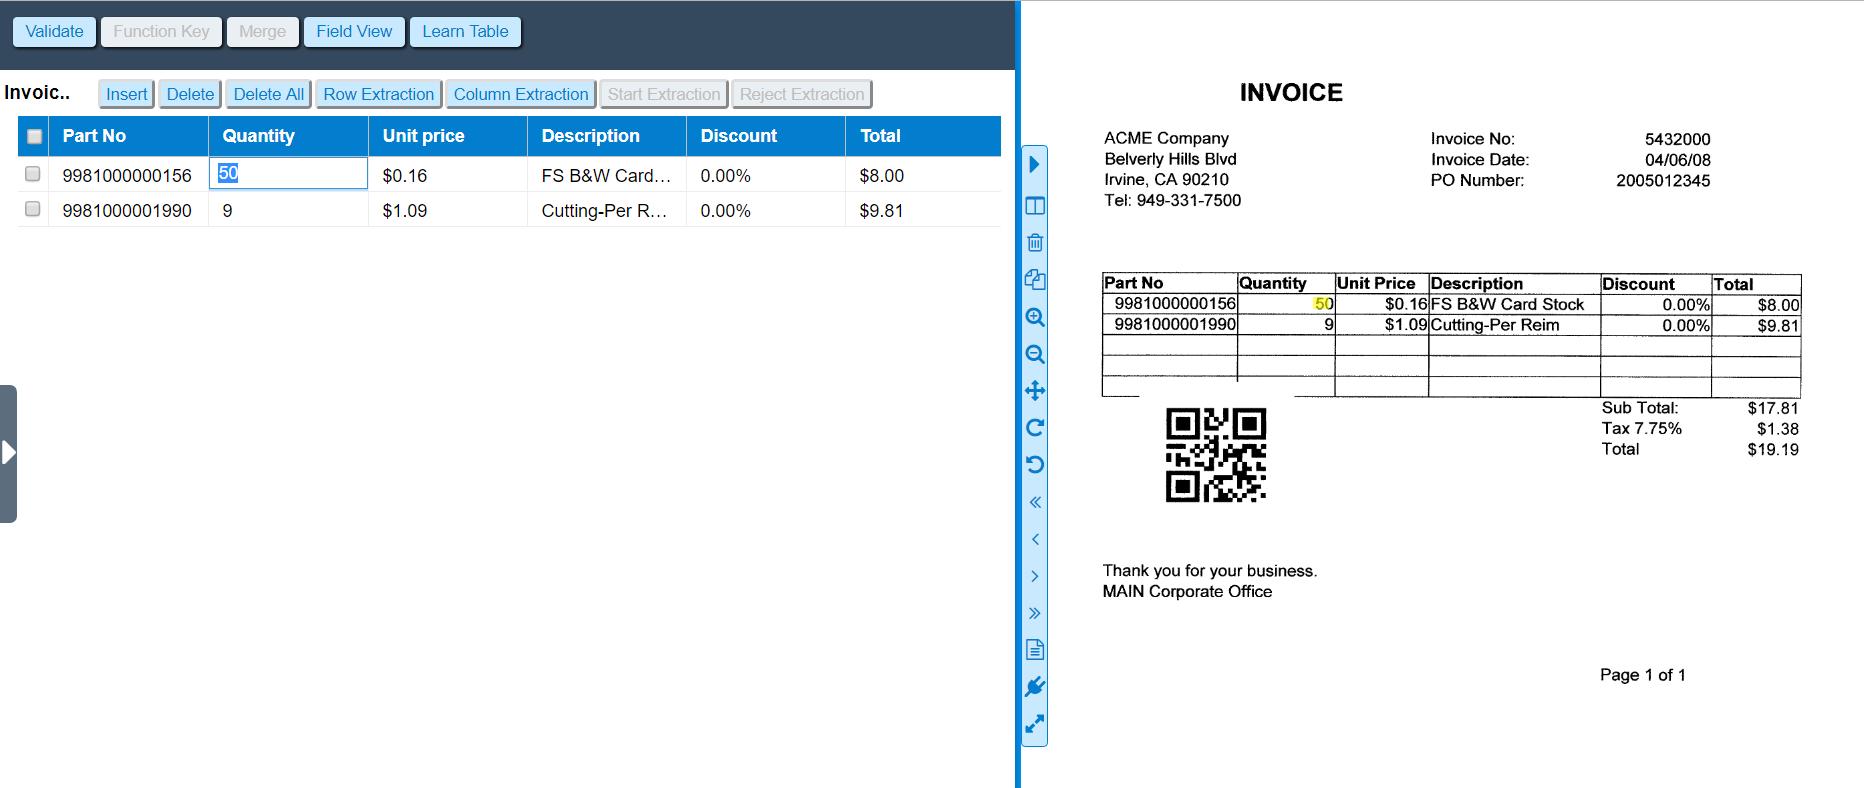 C:\Users\Ephesoft\AppData\Local\Microsoft\Windows\INetCache\Content.Word\tableextr.png